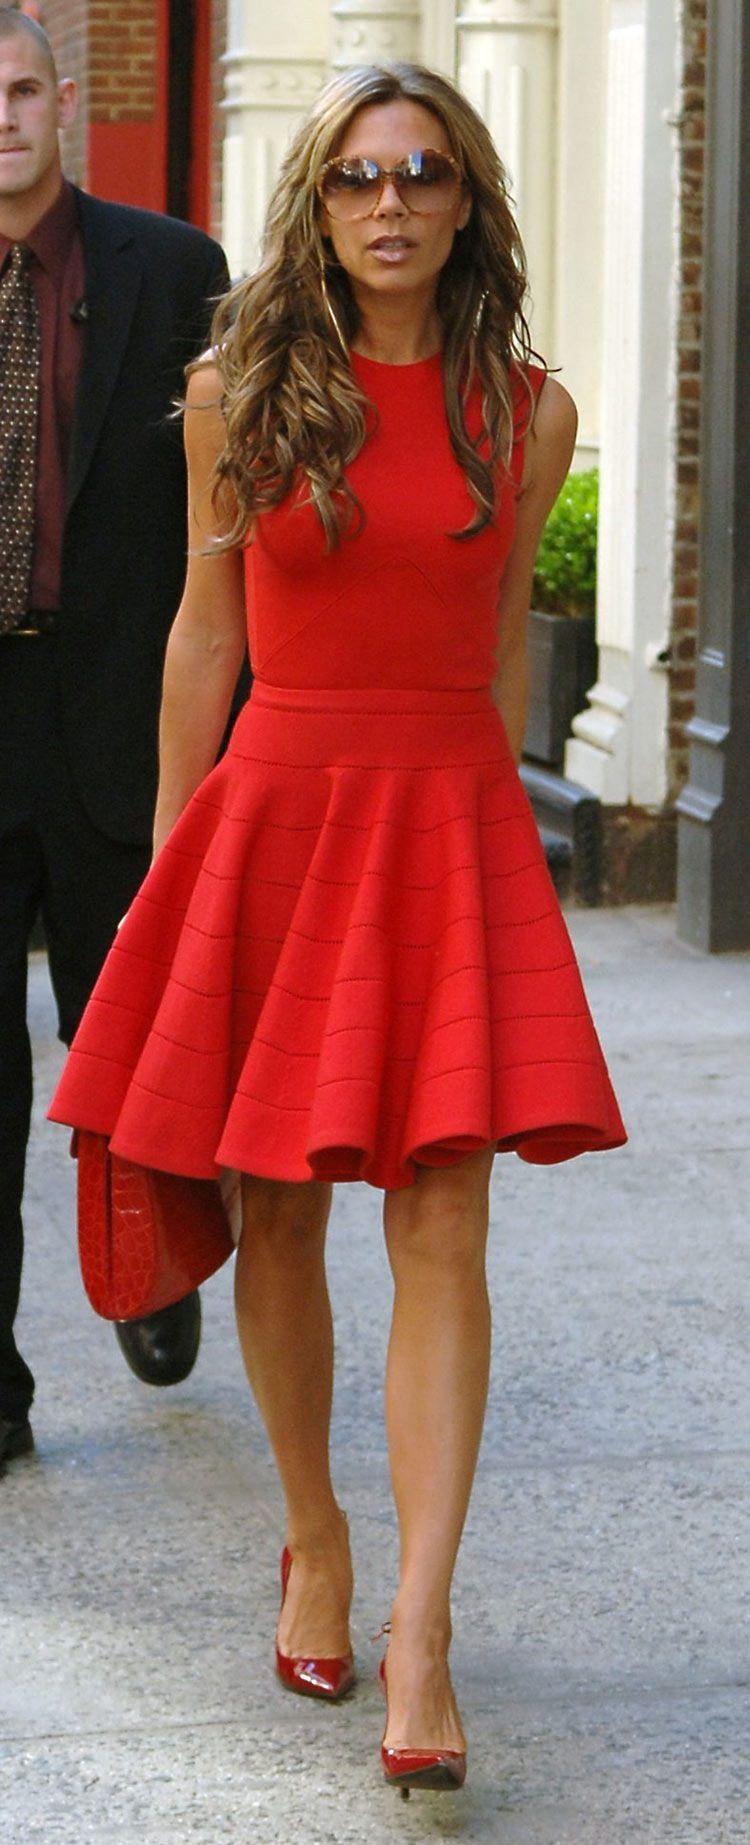 Pin By Latonia Washington On Moda T Red Dress Street Style Style Street Style Dress [ 1845 x 750 Pixel ]